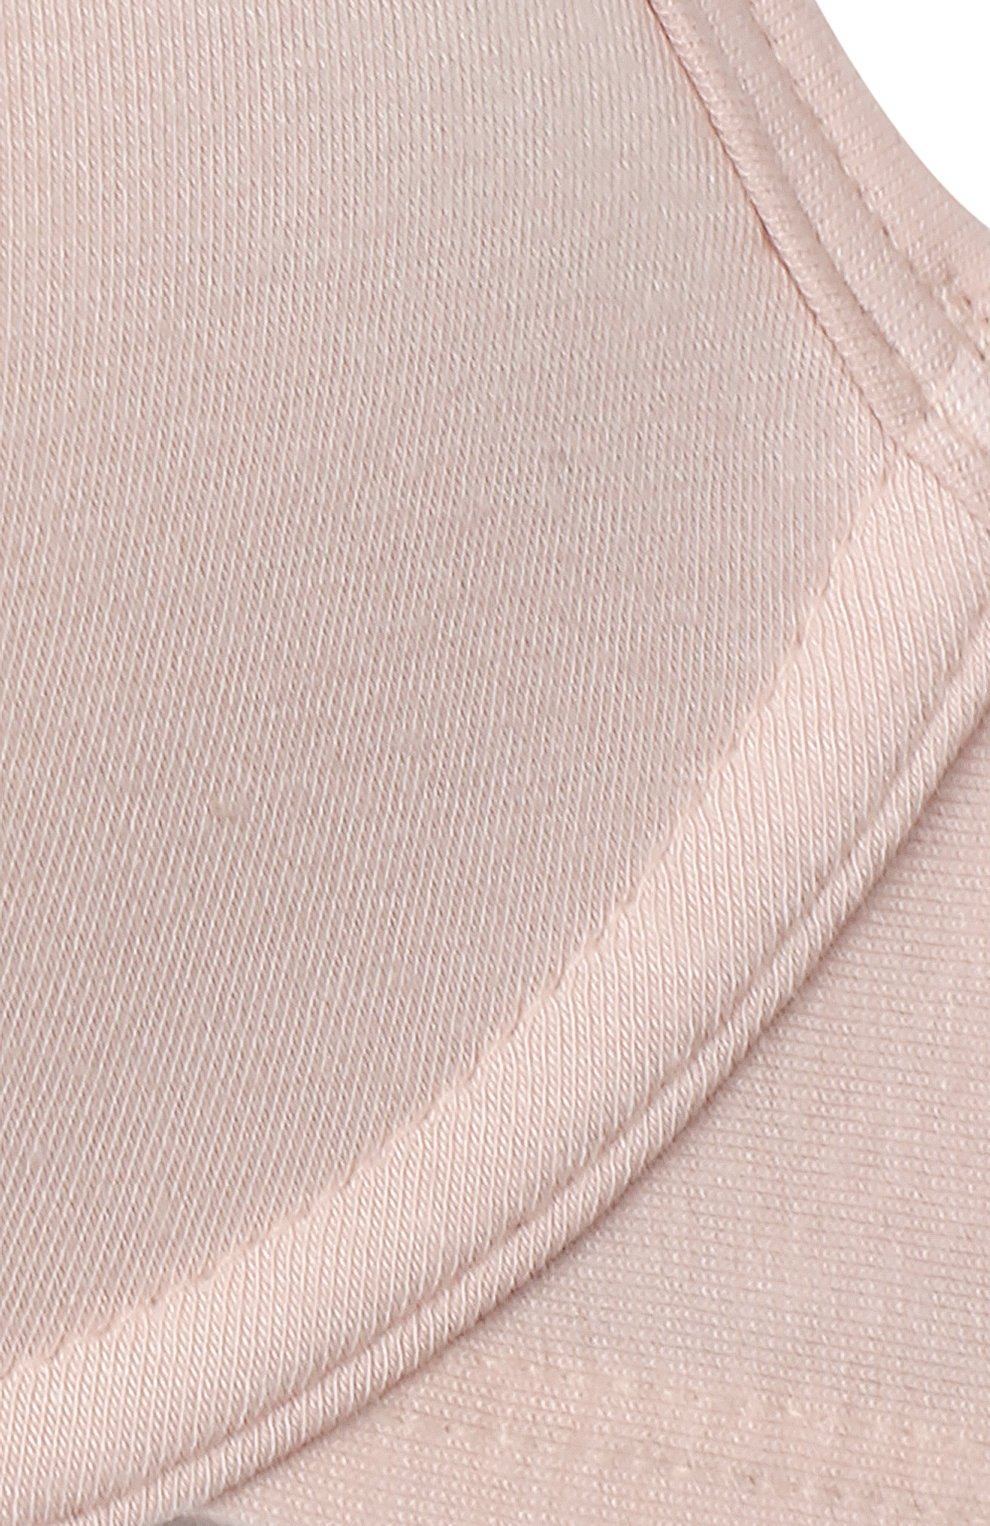 Детский бюстгальтер SANETTA бежевого цвета, арт. 345863. | Фото 3